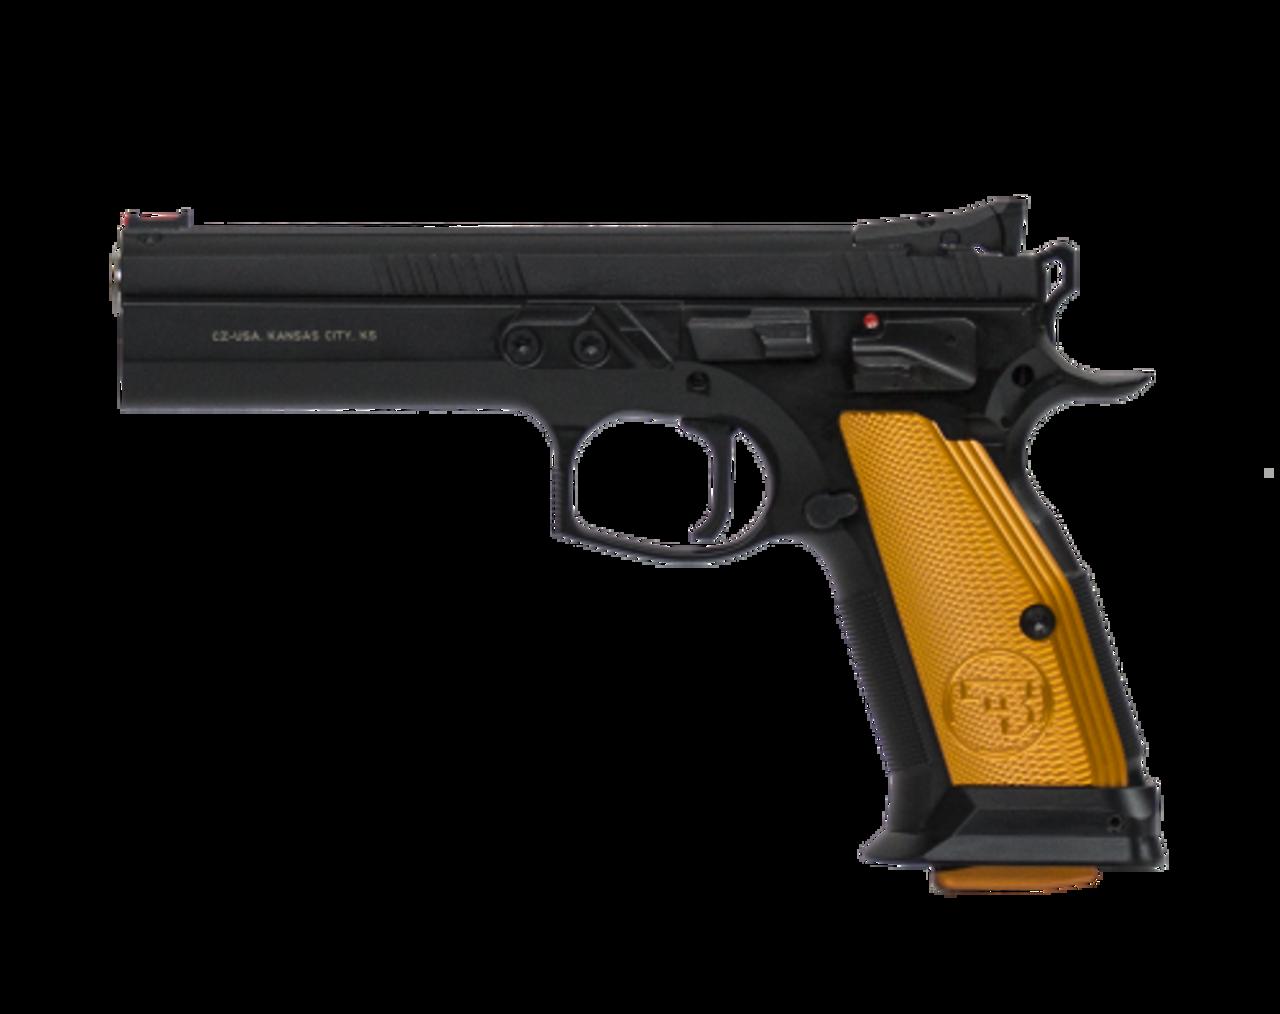 "CZ 75 TS (Tactical Sport) Orange Semi-Auto Pistol, 9mm, Orange Grips, Adjustable Sights, 5.4"" Barrel, 10 Rounds"